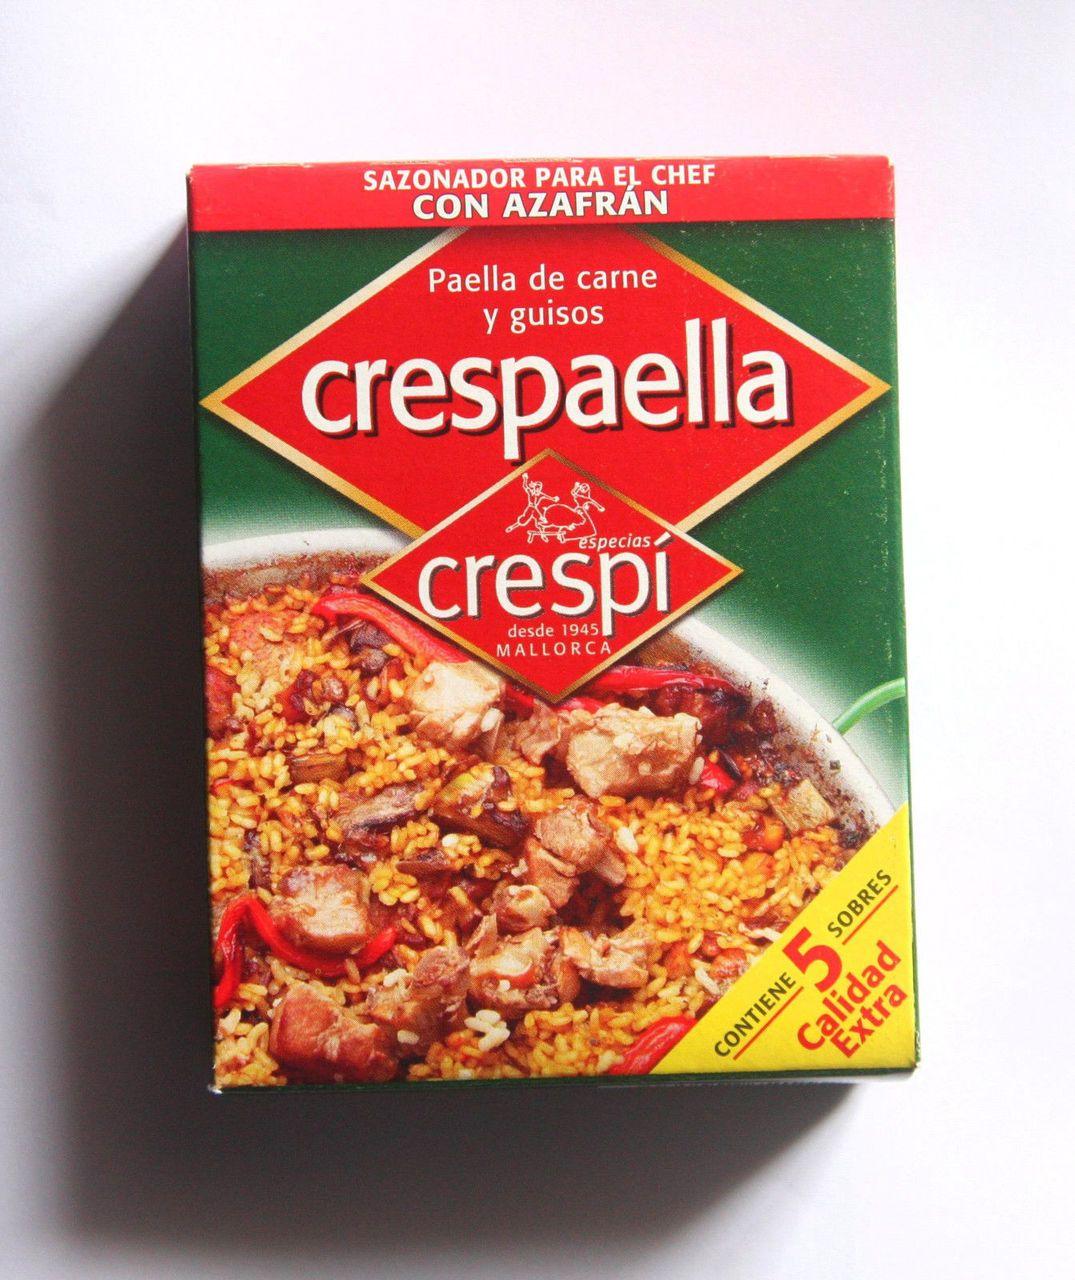 Http Www Spanishdoor Com Original Spanish Paella Azafran Spice Blend Traditional Spain Saffron Mix Paellaspice